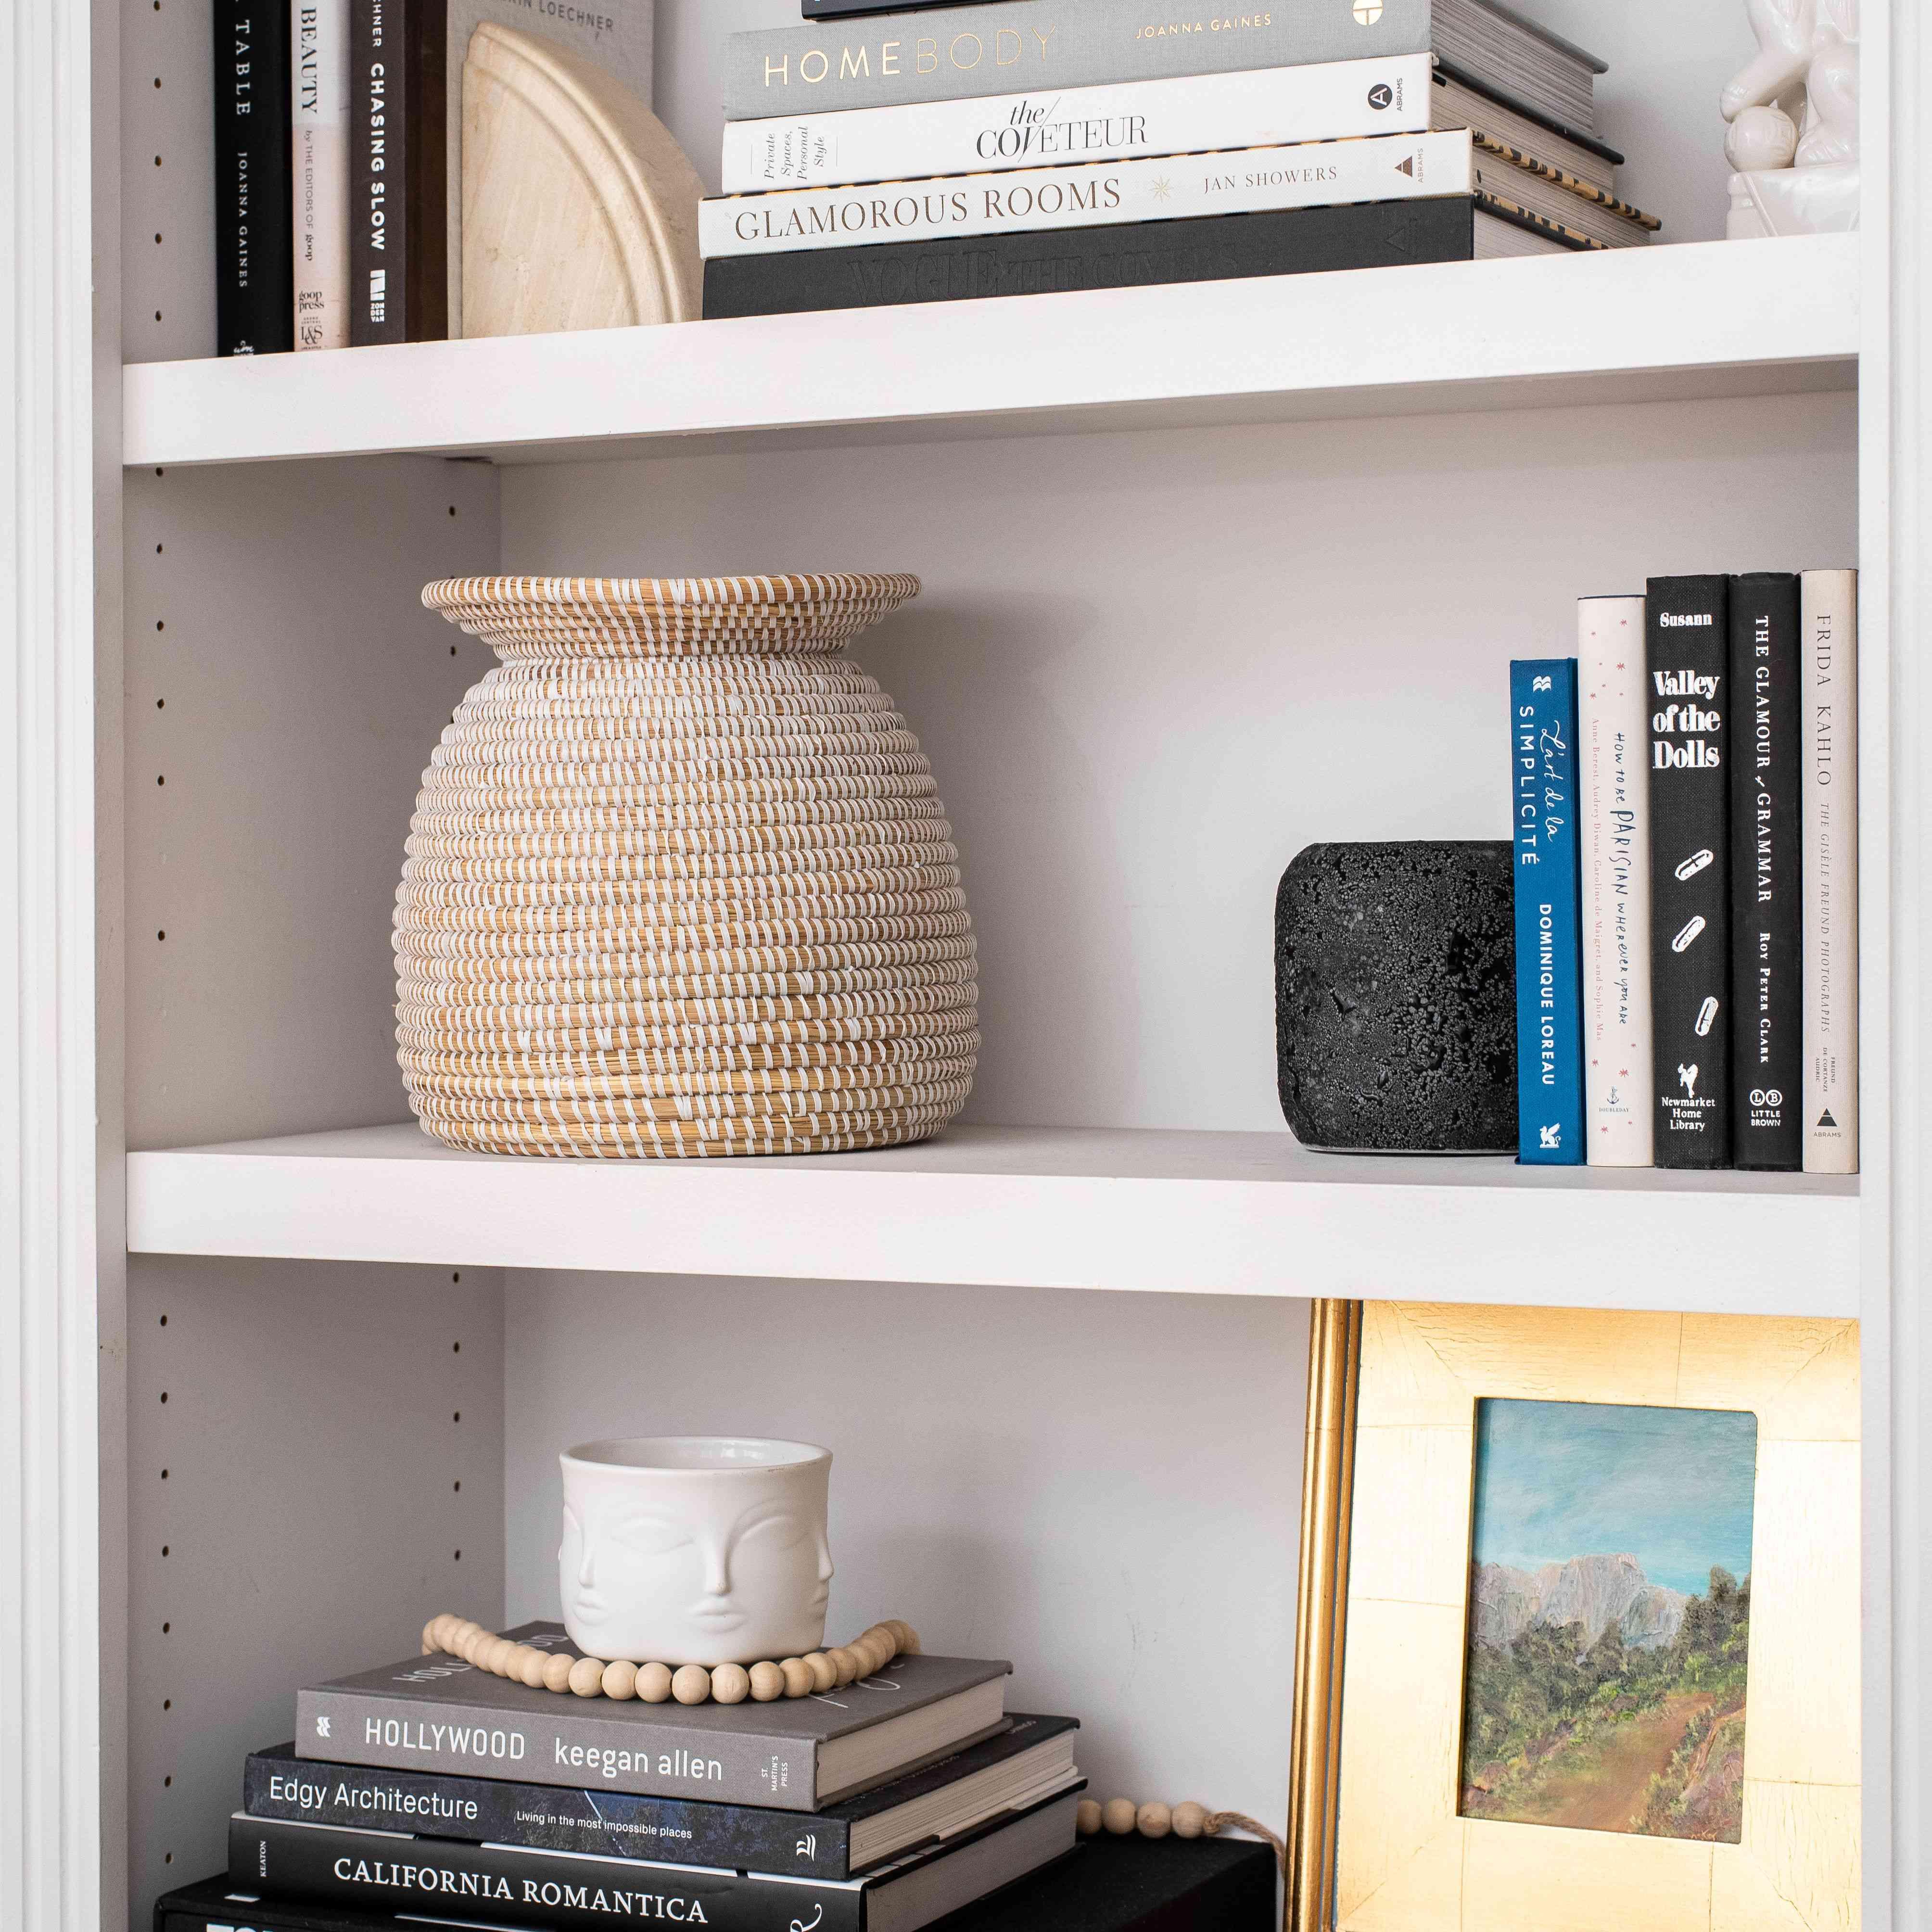 Decorative objects on shelf.